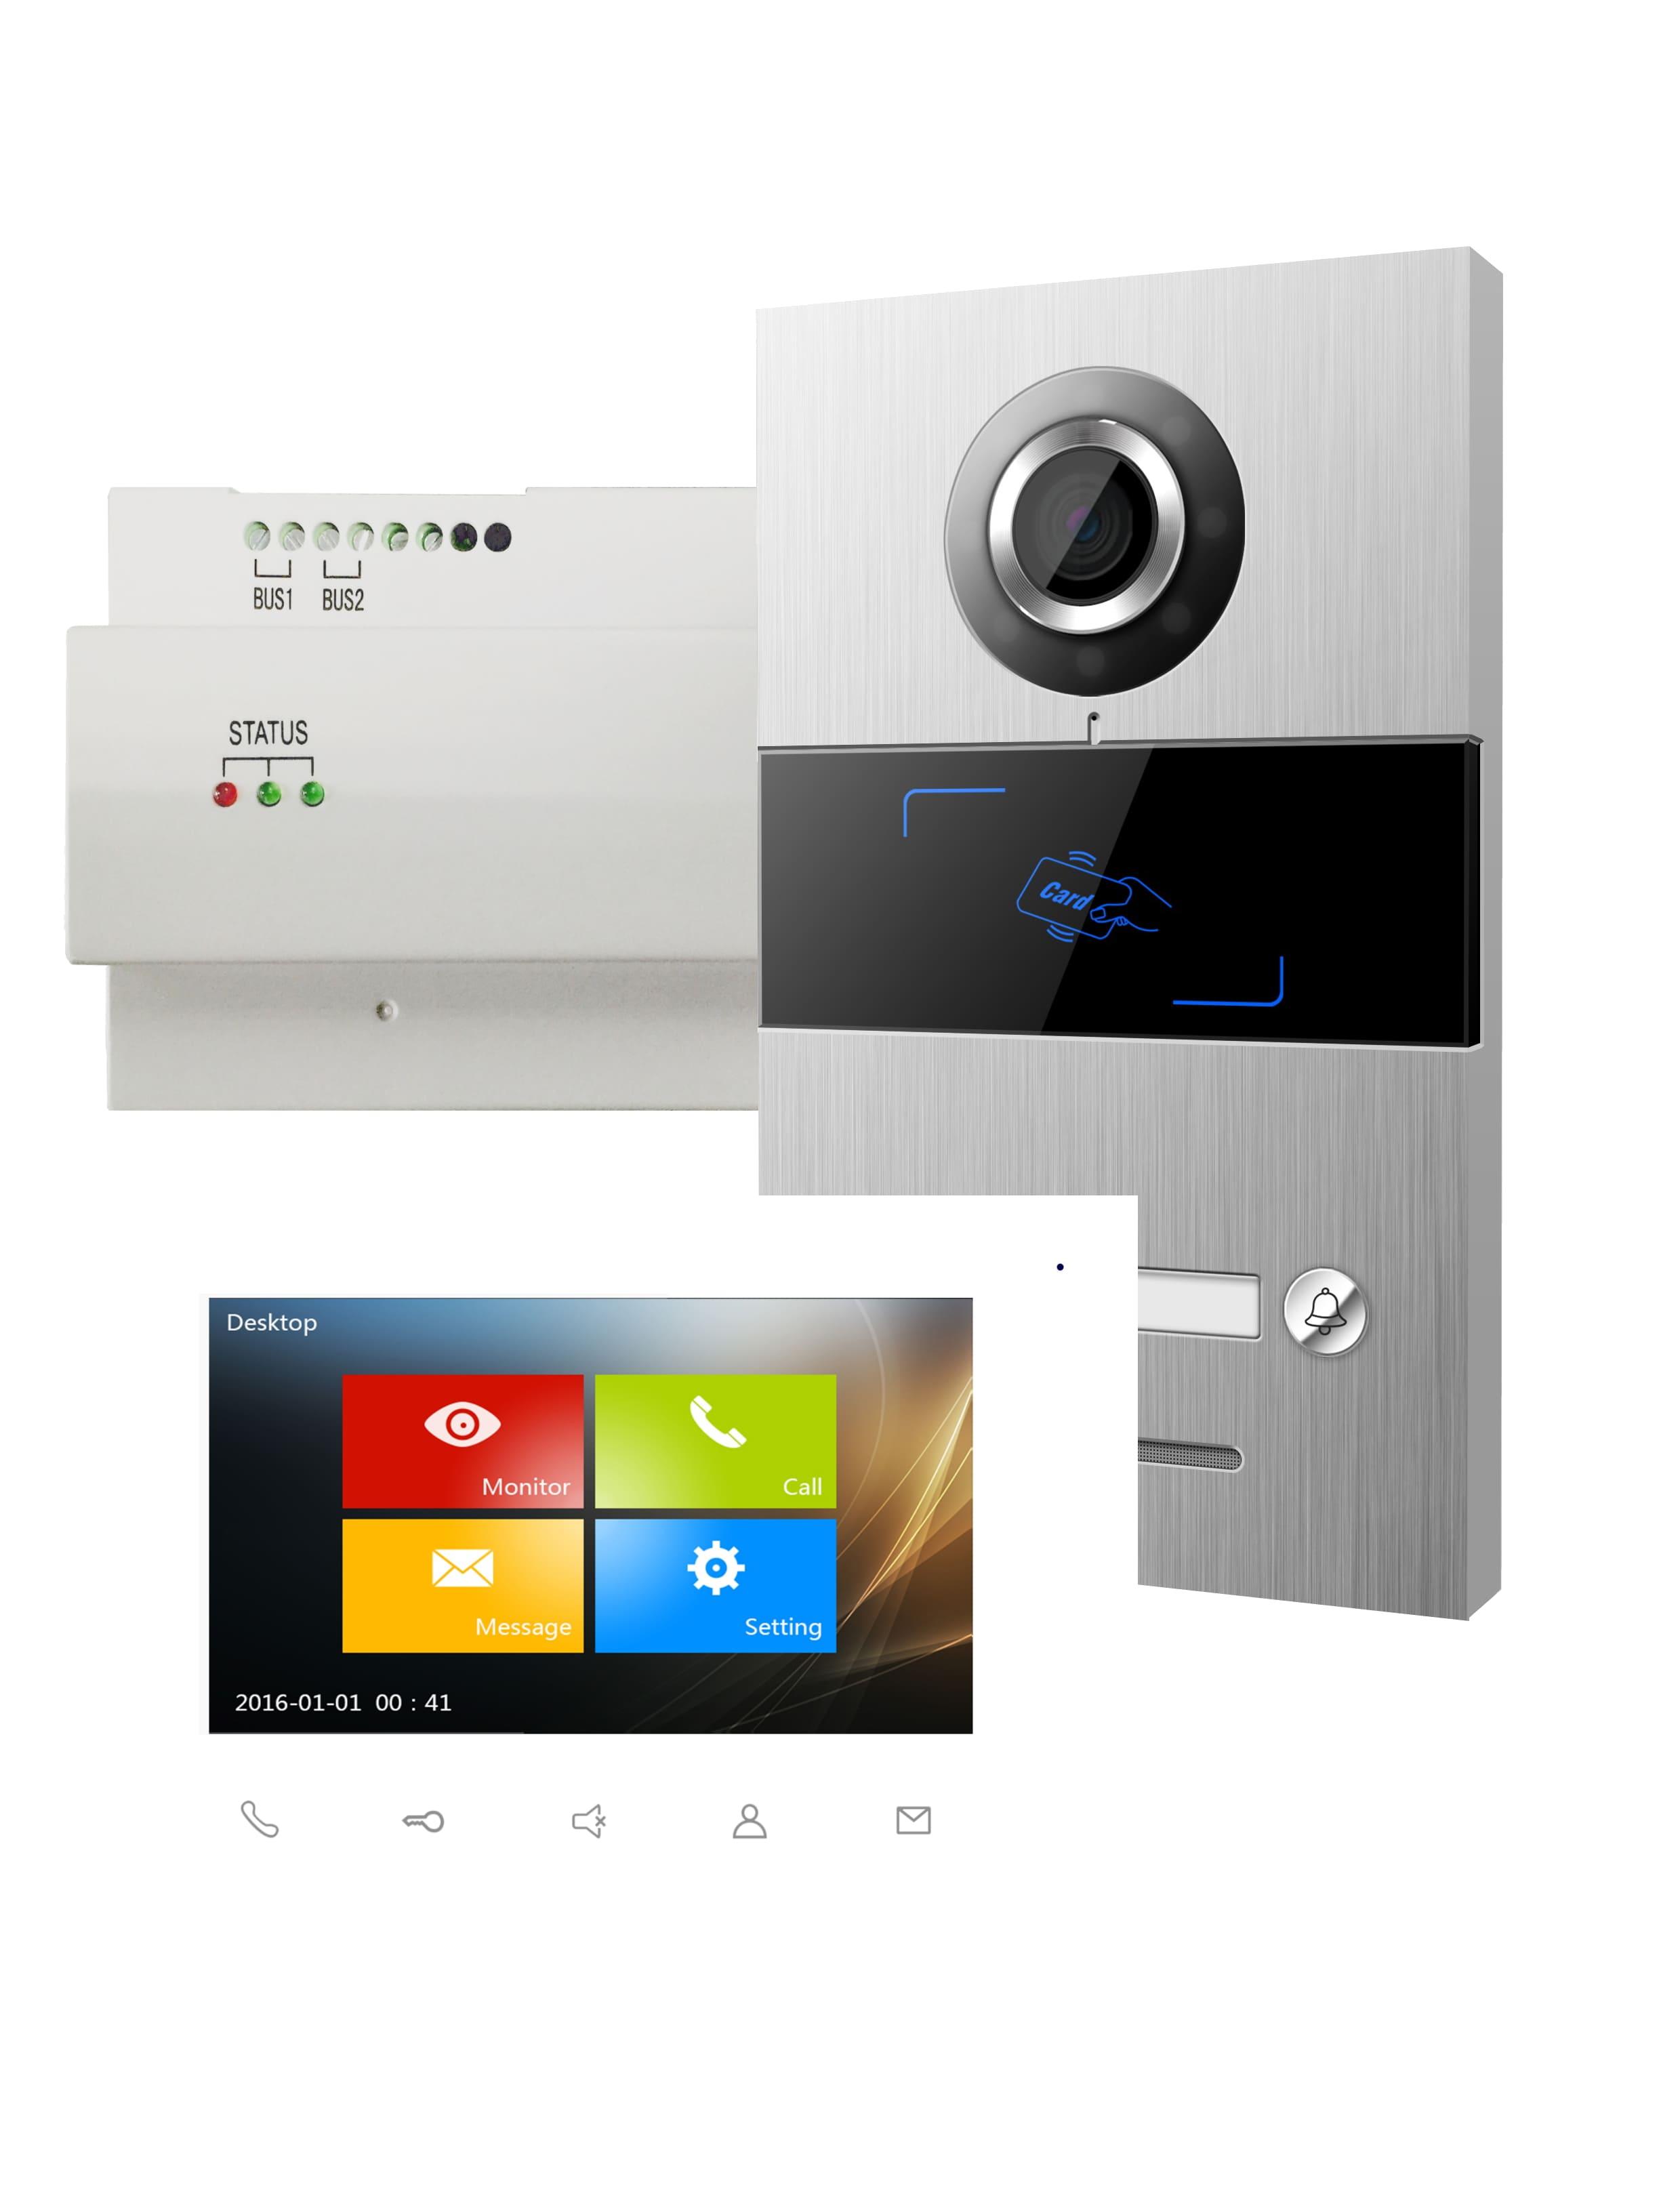 Viko Panasonic Video Türsprechanlagen Set VILLA SET 1 1-Familien-Set